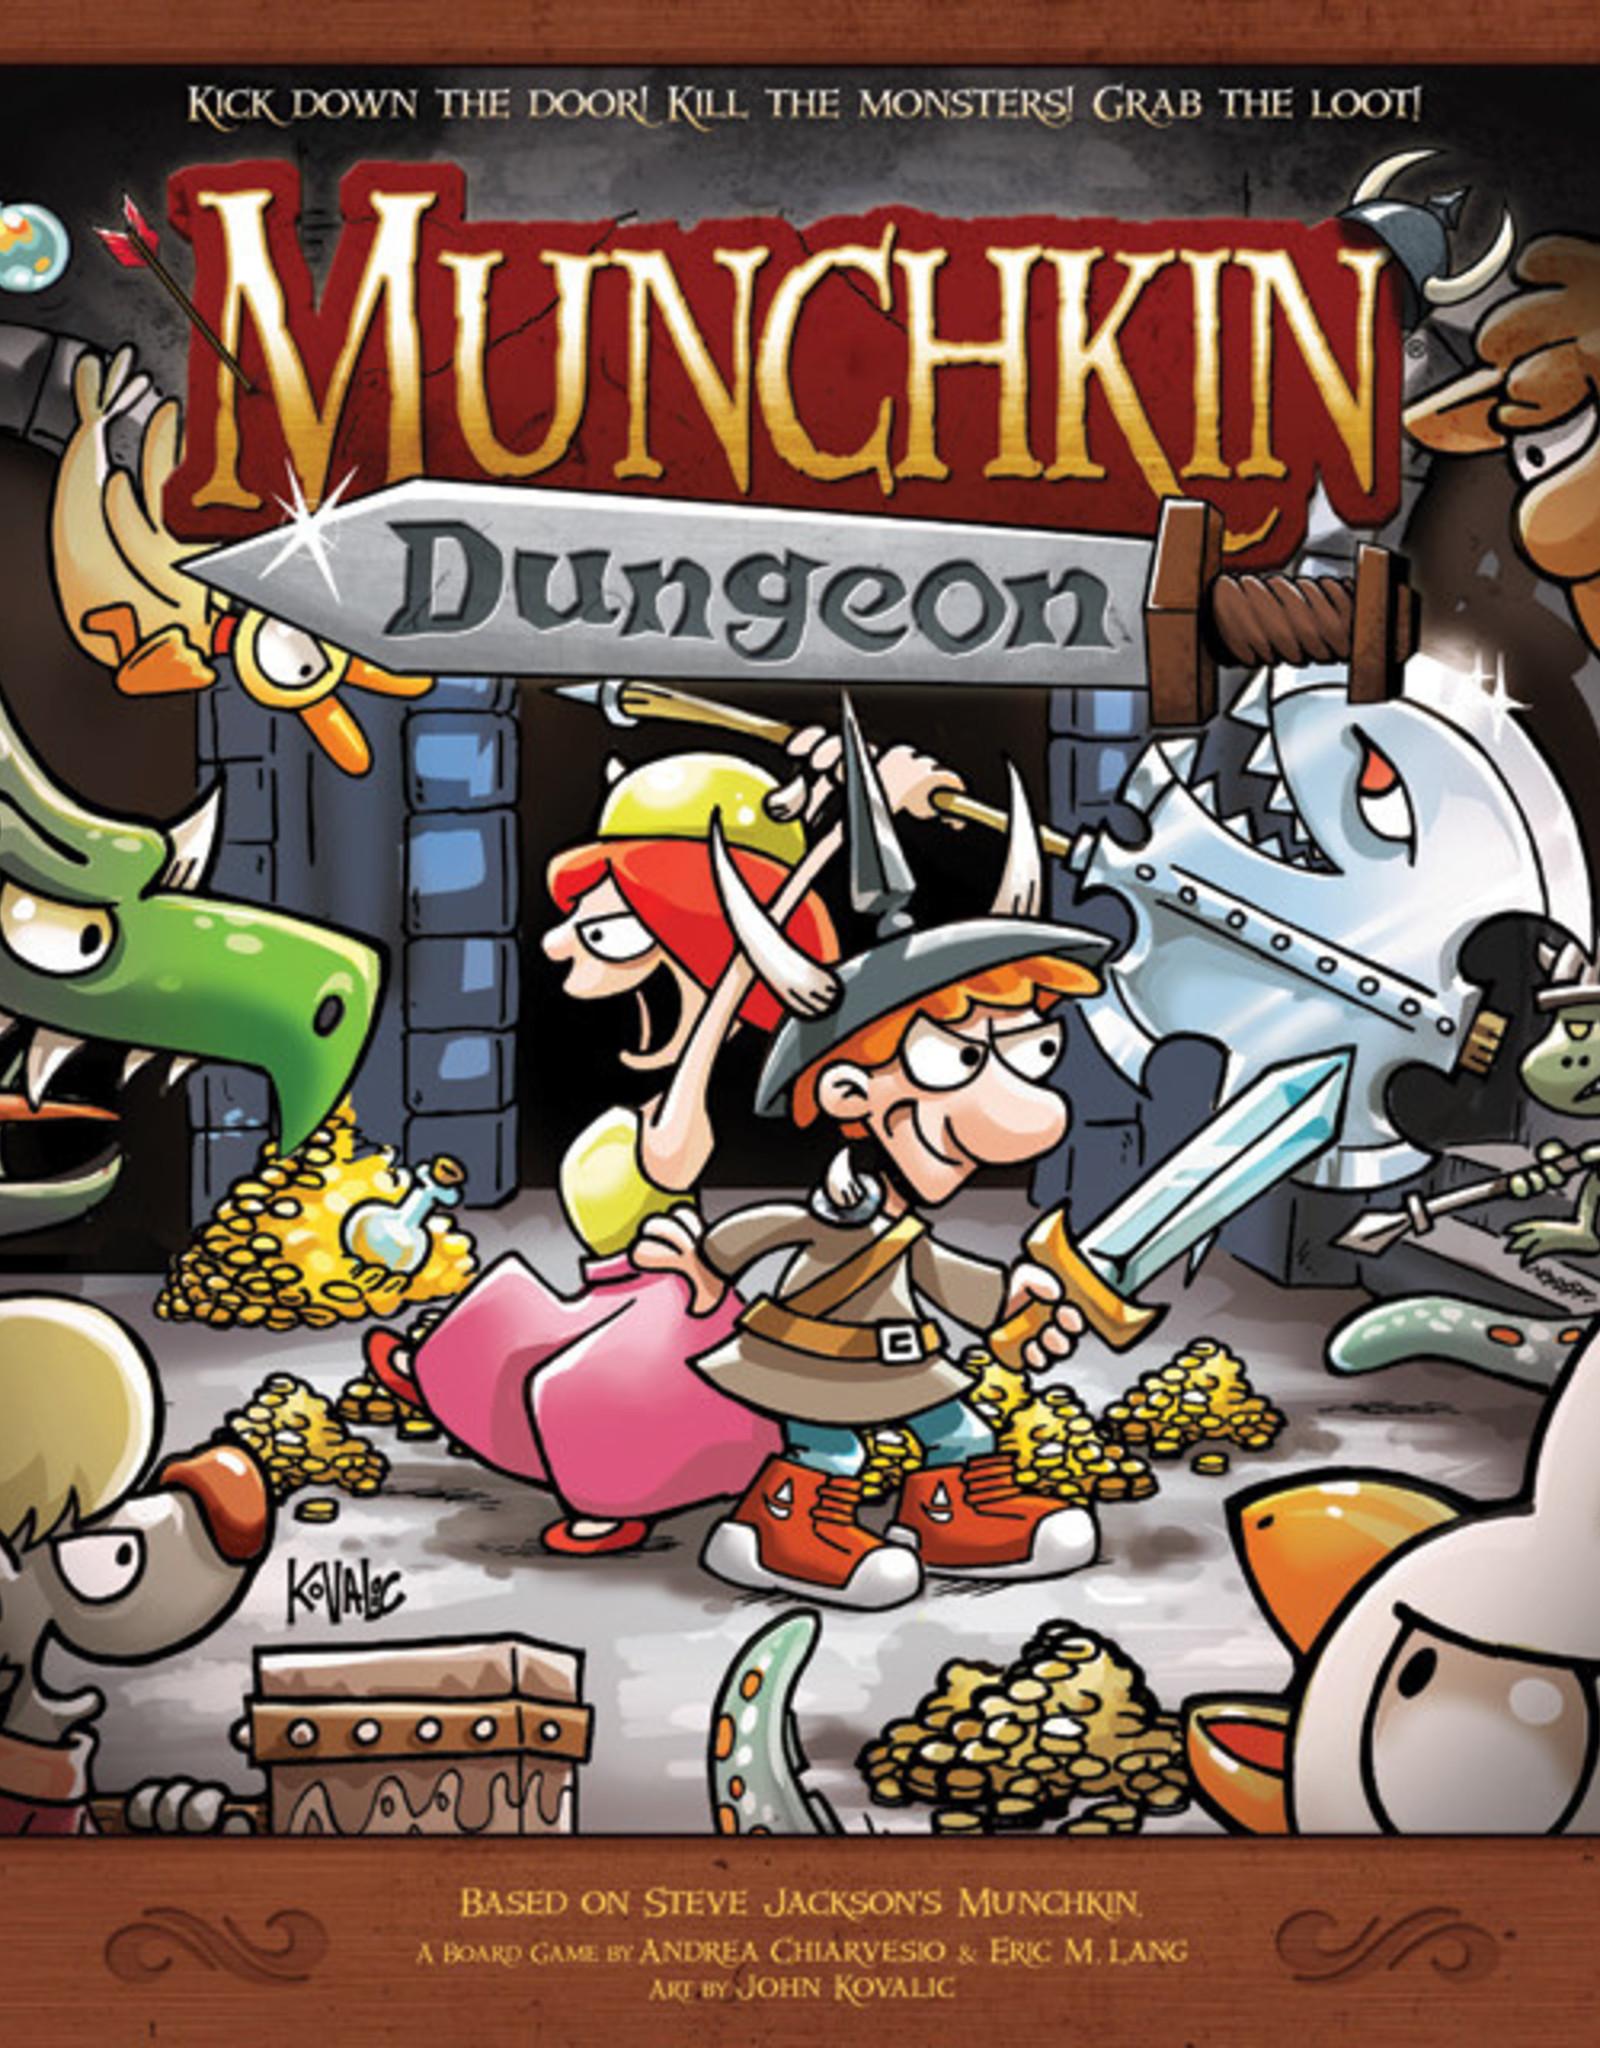 Munchkin Munchkin Dungeon